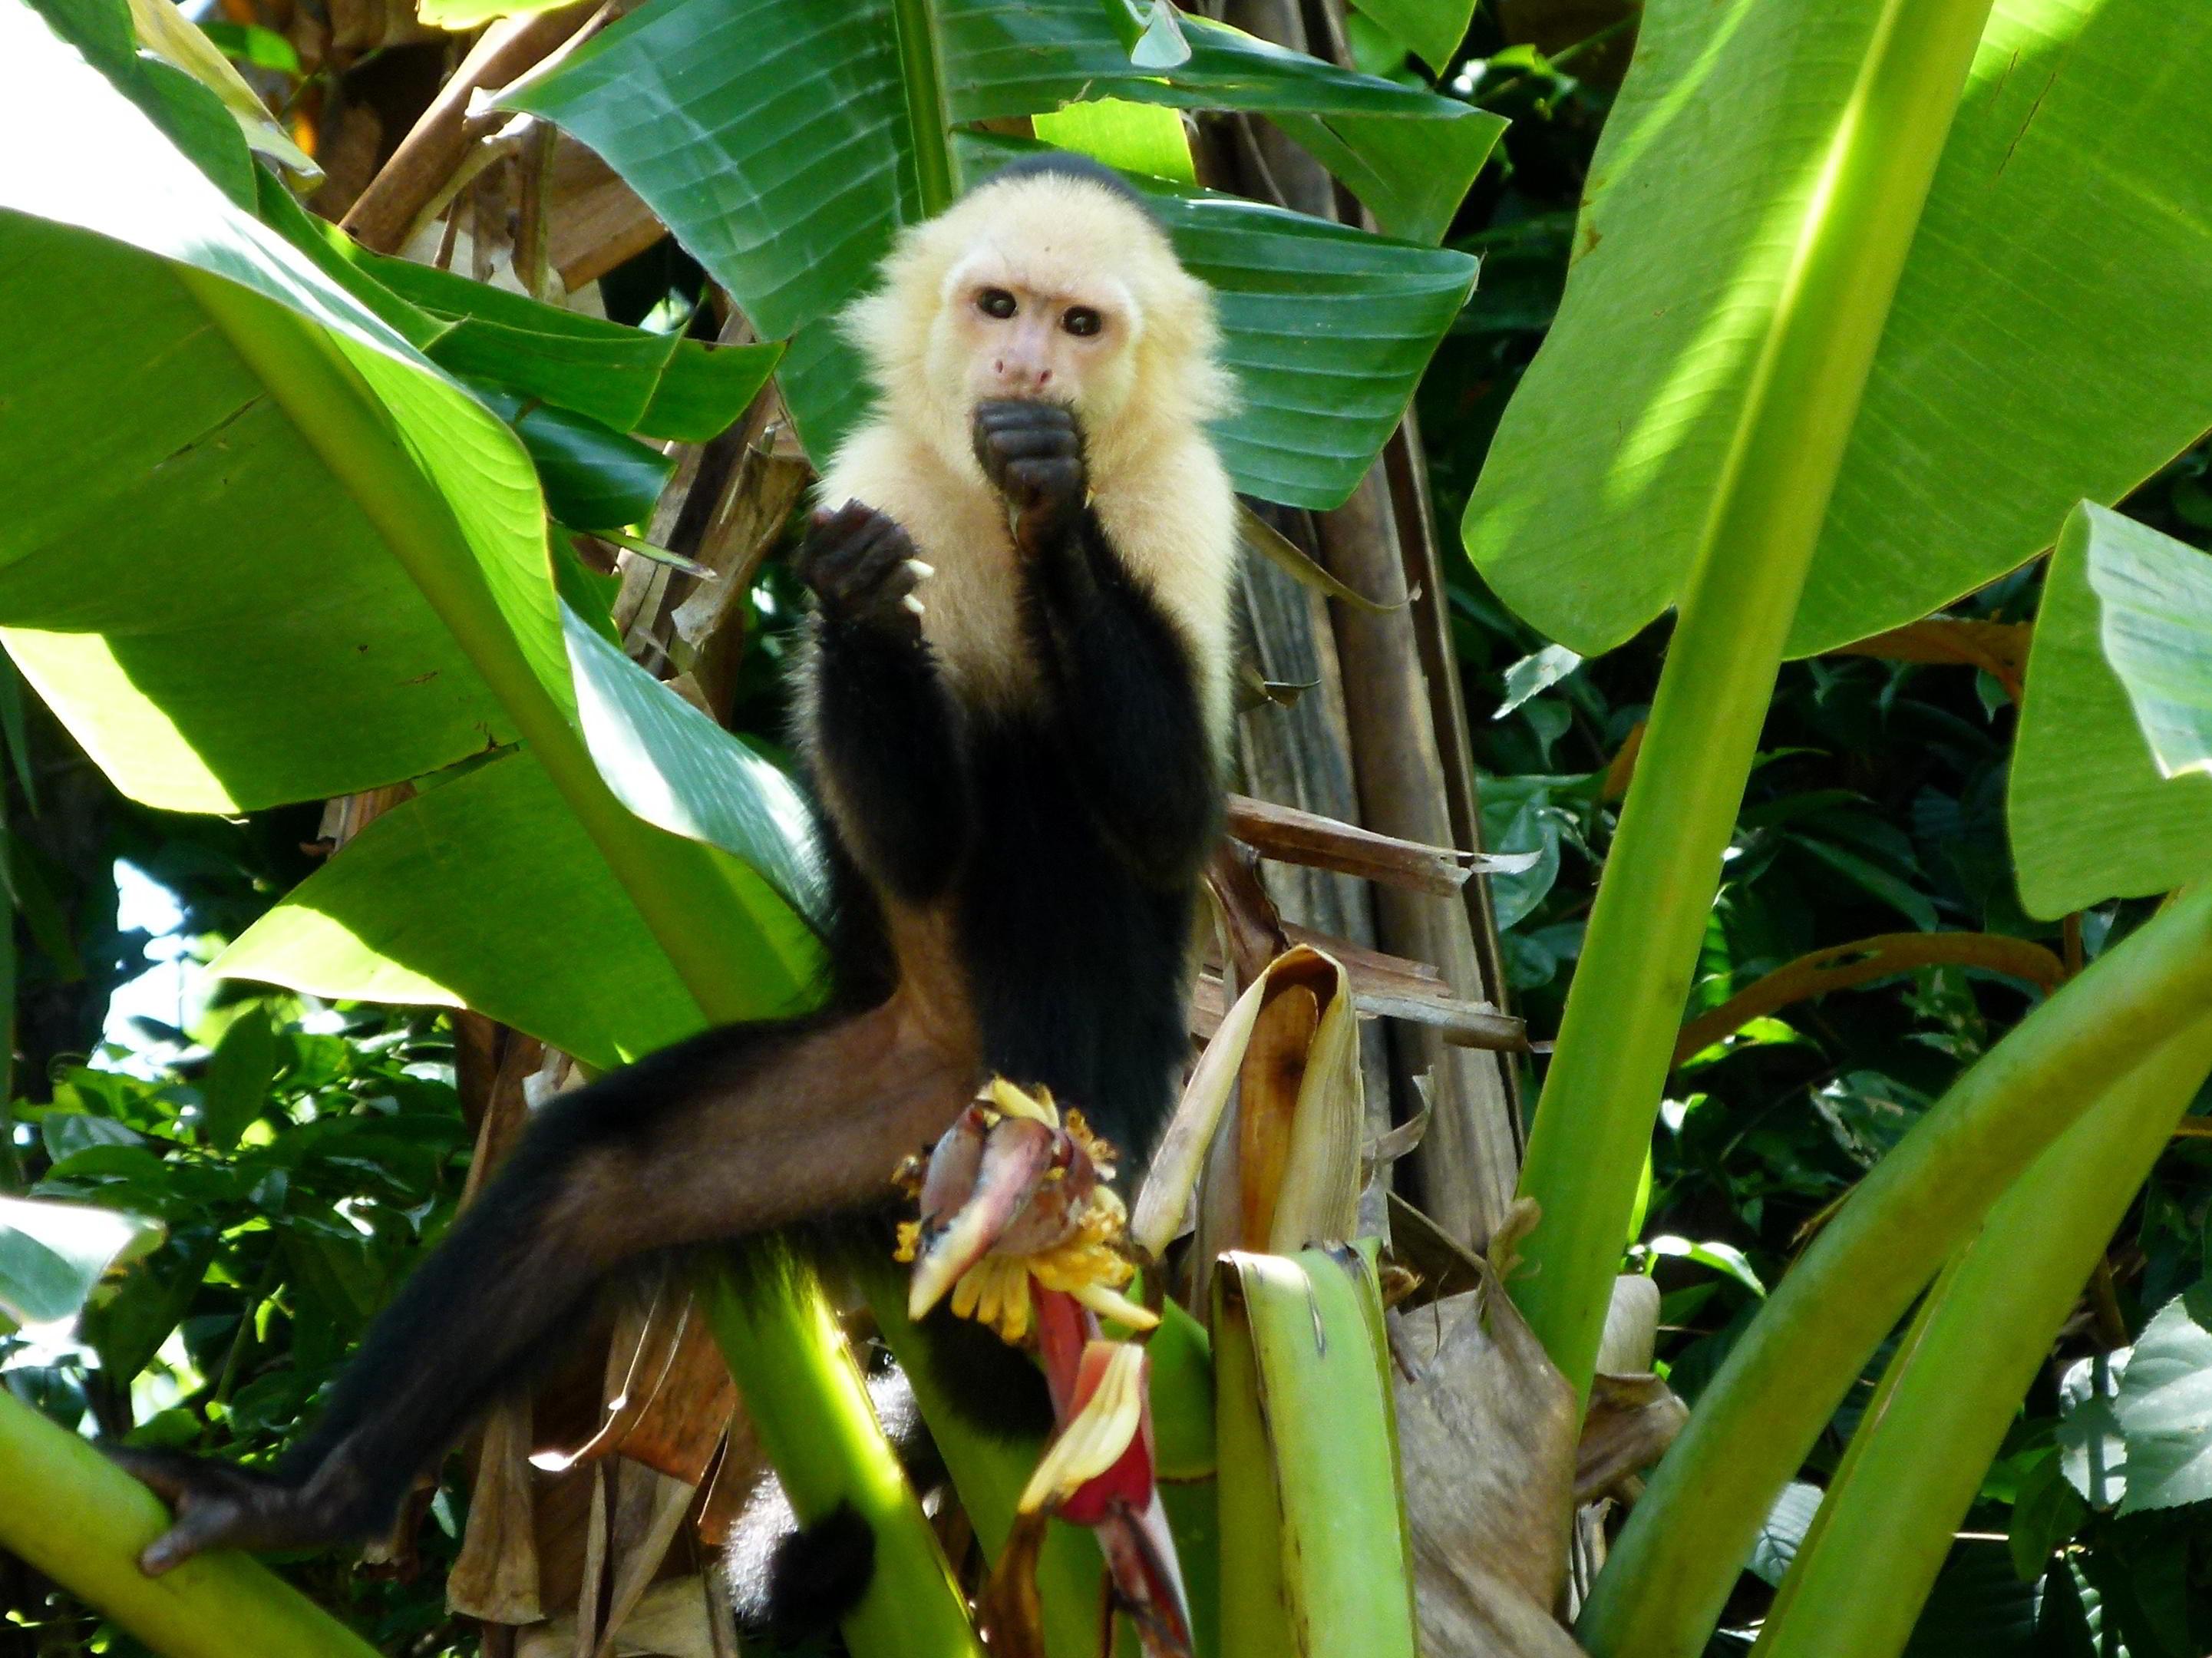 kokomana-kokopelli-logo-restaurant-sierpe-ballena-tales-osa-enjoy-tours-puravida-nature-iguana-nature-monkey